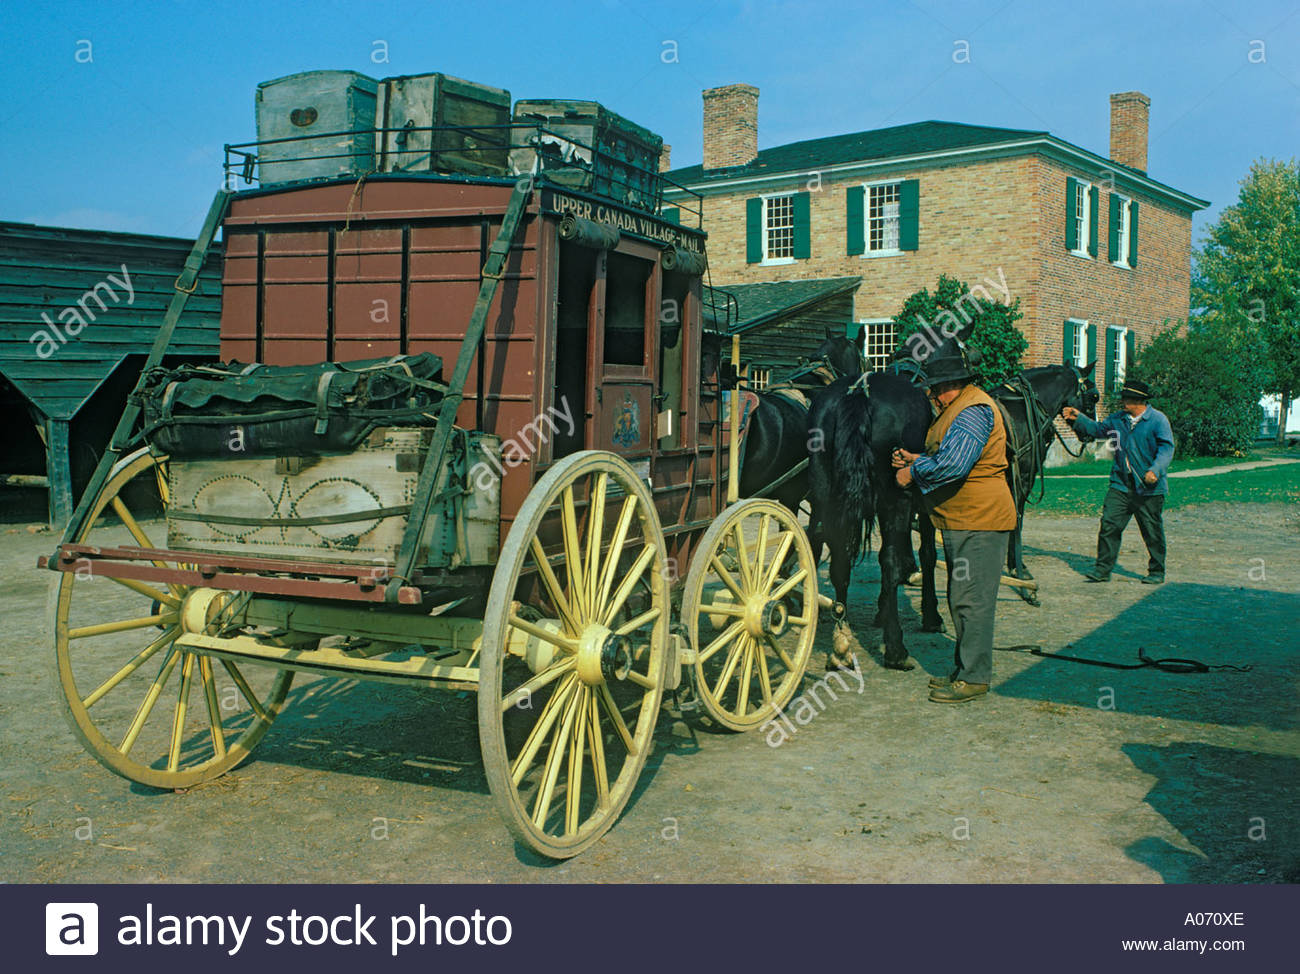 stagecoach-at-upper-canada-village-near-